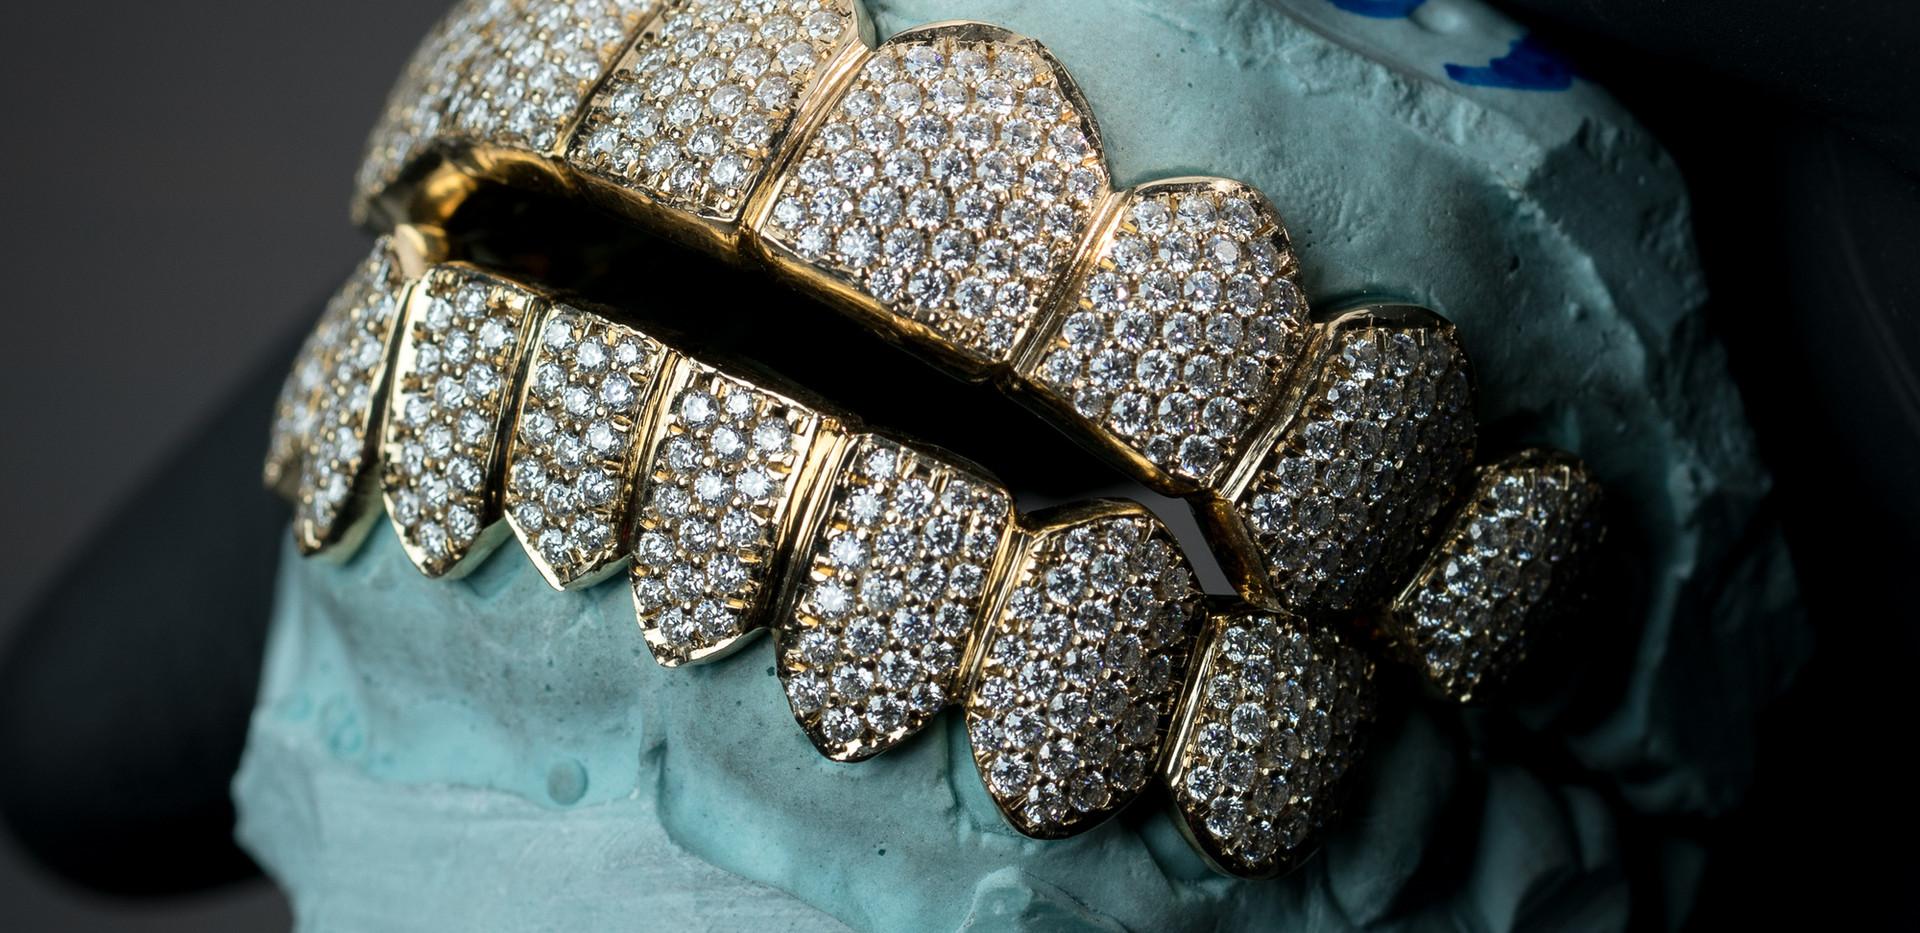 8 on 8 Grillz Designed By. Tim Da Jeweler